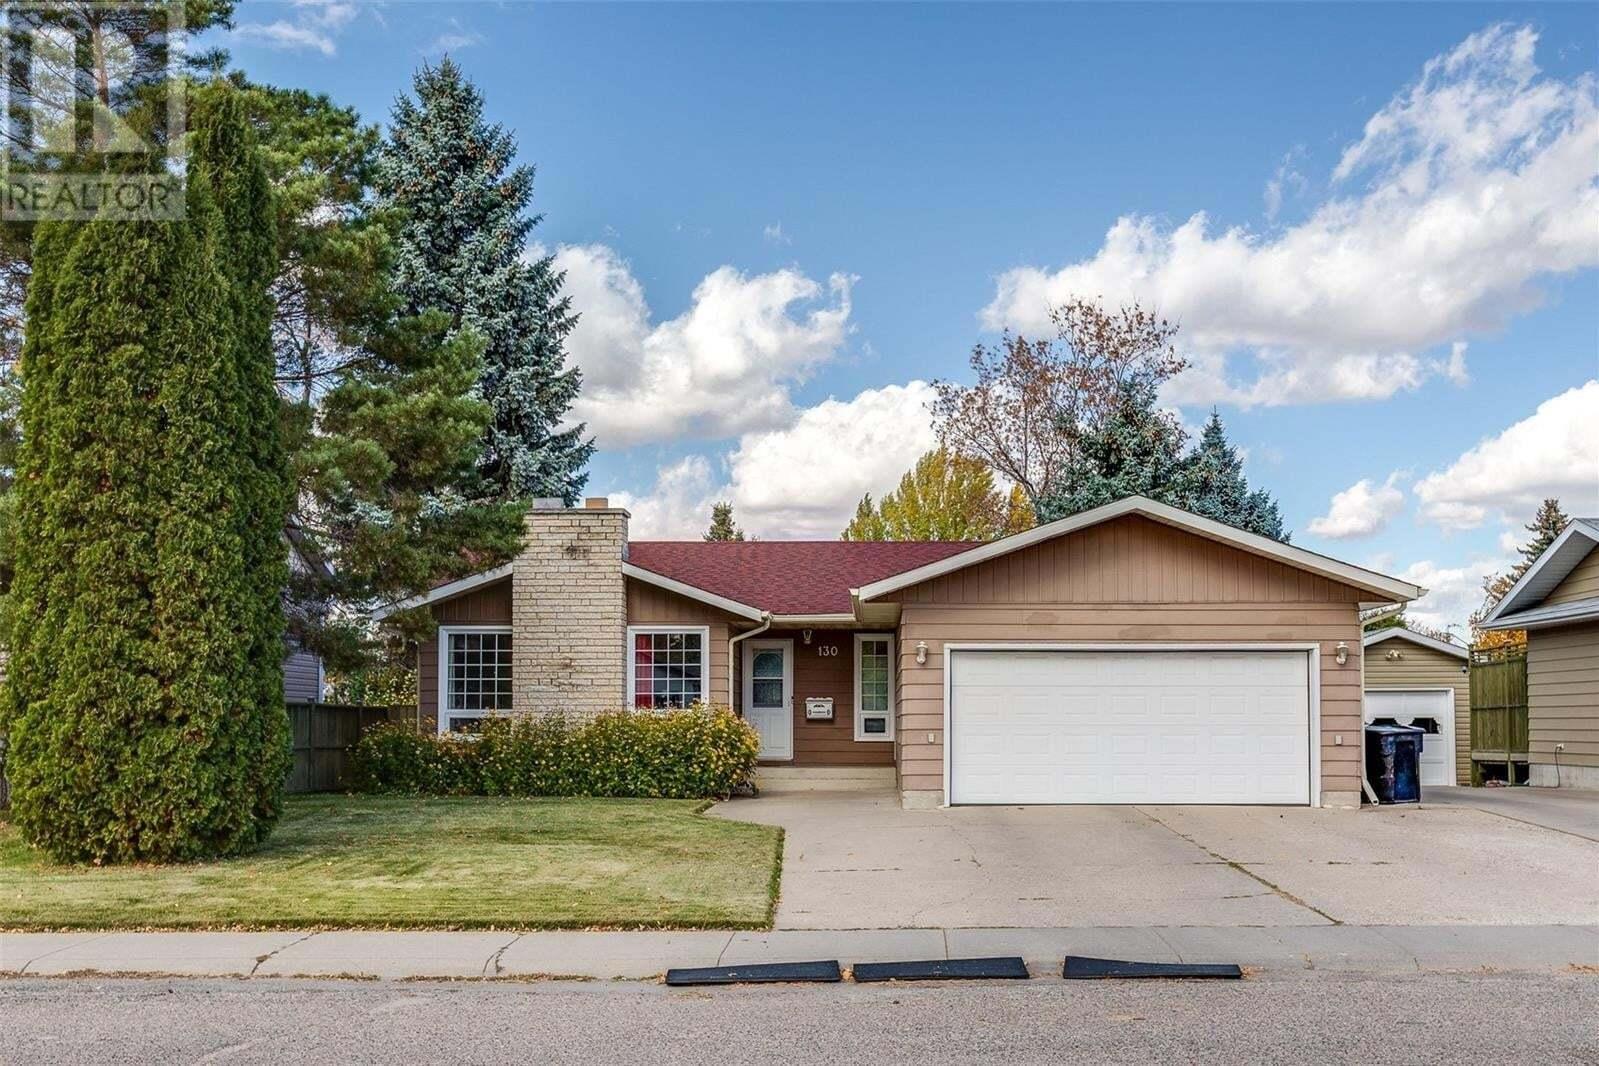 House for sale at 130 Haight Cres Saskatoon Saskatchewan - MLS: SK830077